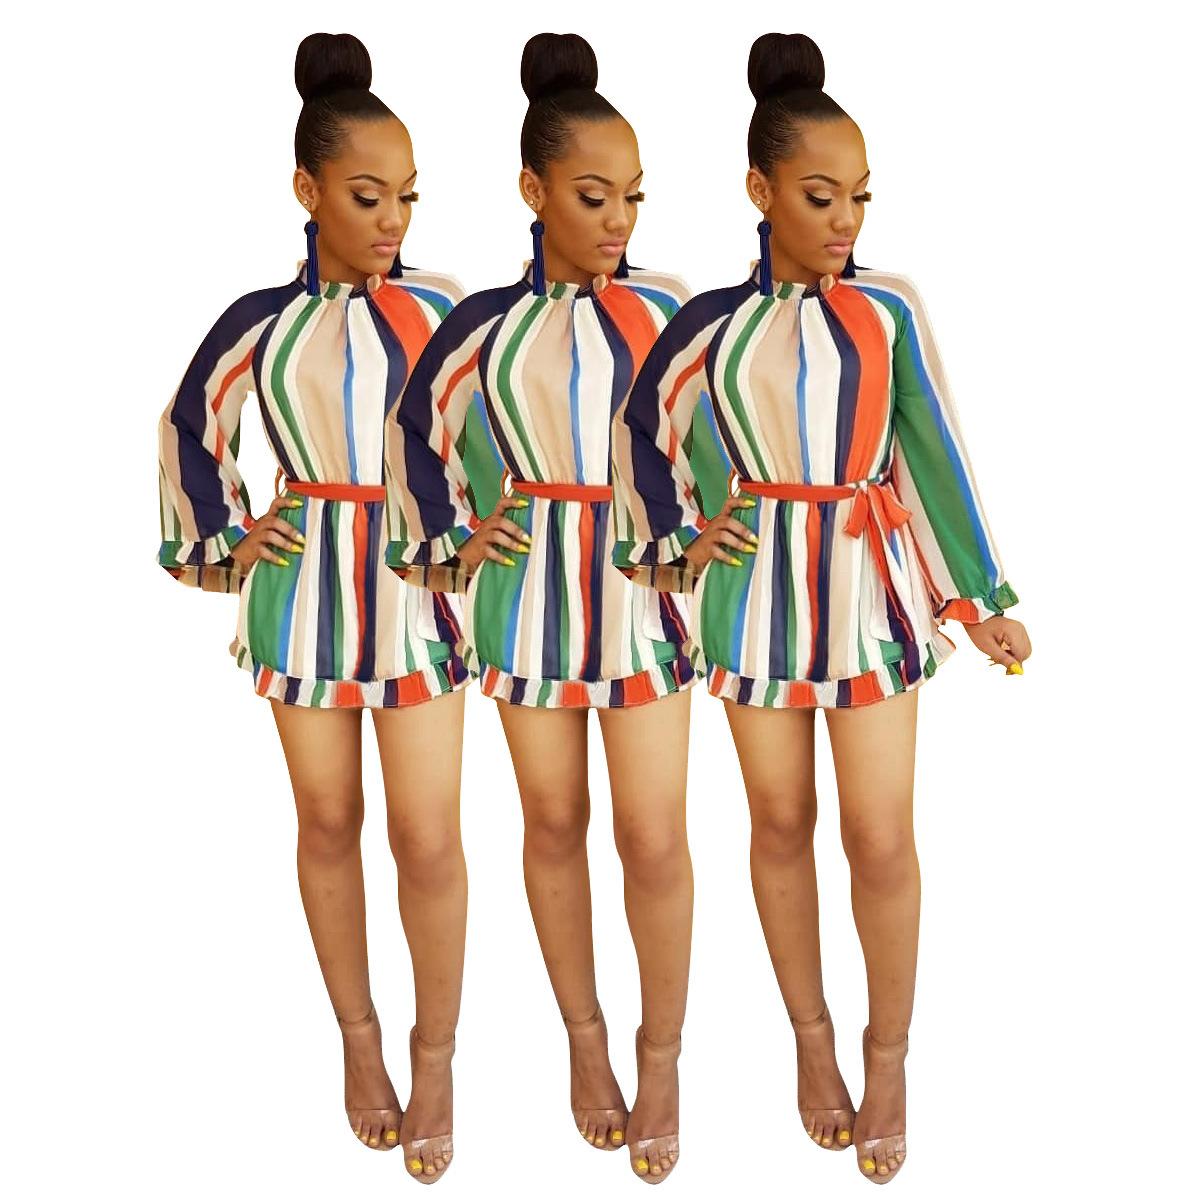 D9017亚马逊ebay速卖通wish热卖欧美女装 彩色条纹印花宽松连衣裙